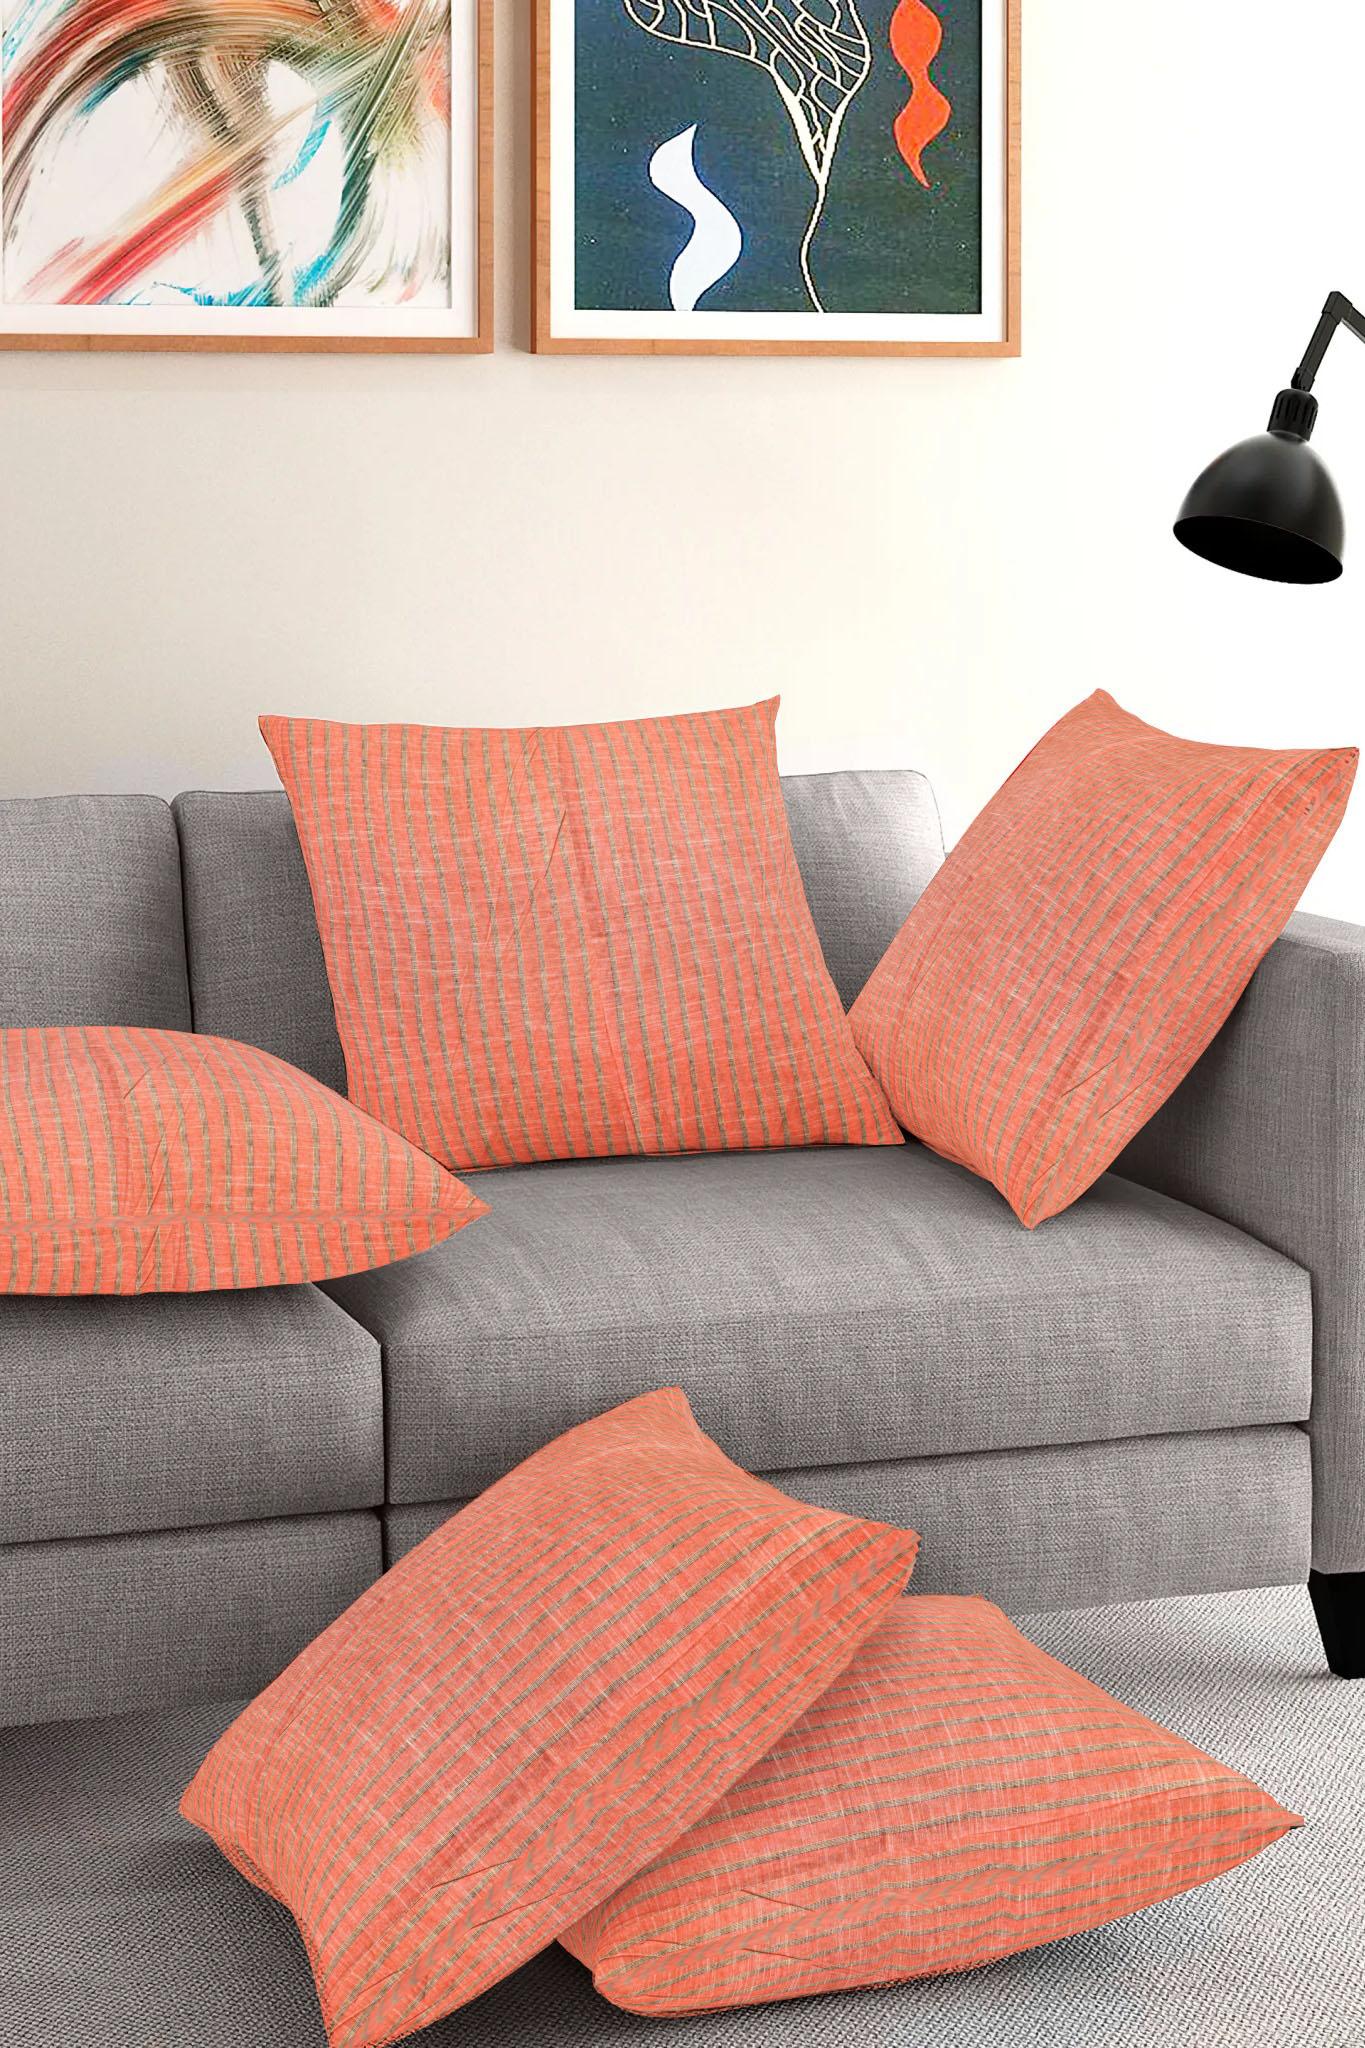 /home/customer/www/fabartcraft.com/public_html/uploadshttps://www.shopolics.com/uploads/images/medium/Peach-Gray-Cotton-Cushion-Cover-35416.jpg